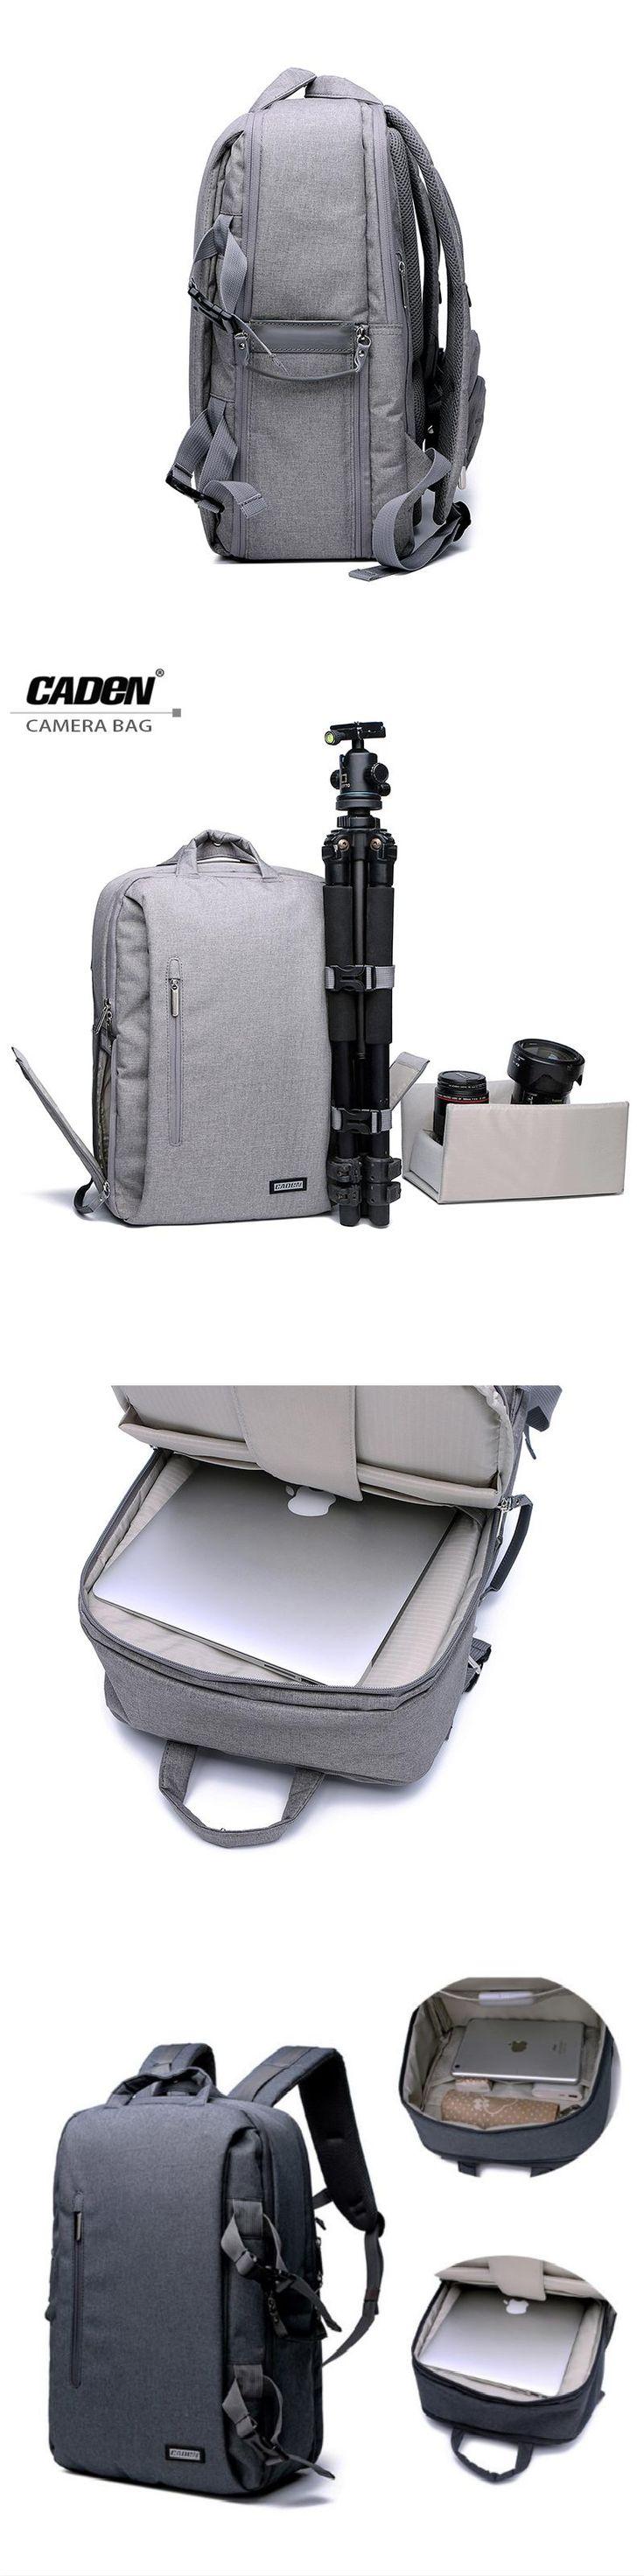 DSLR Camera Backpacks Photo Video Bag Digital Camera Case Packs Waterproof with Rain Cover for Canon Nikon Sony Pentax L5-1